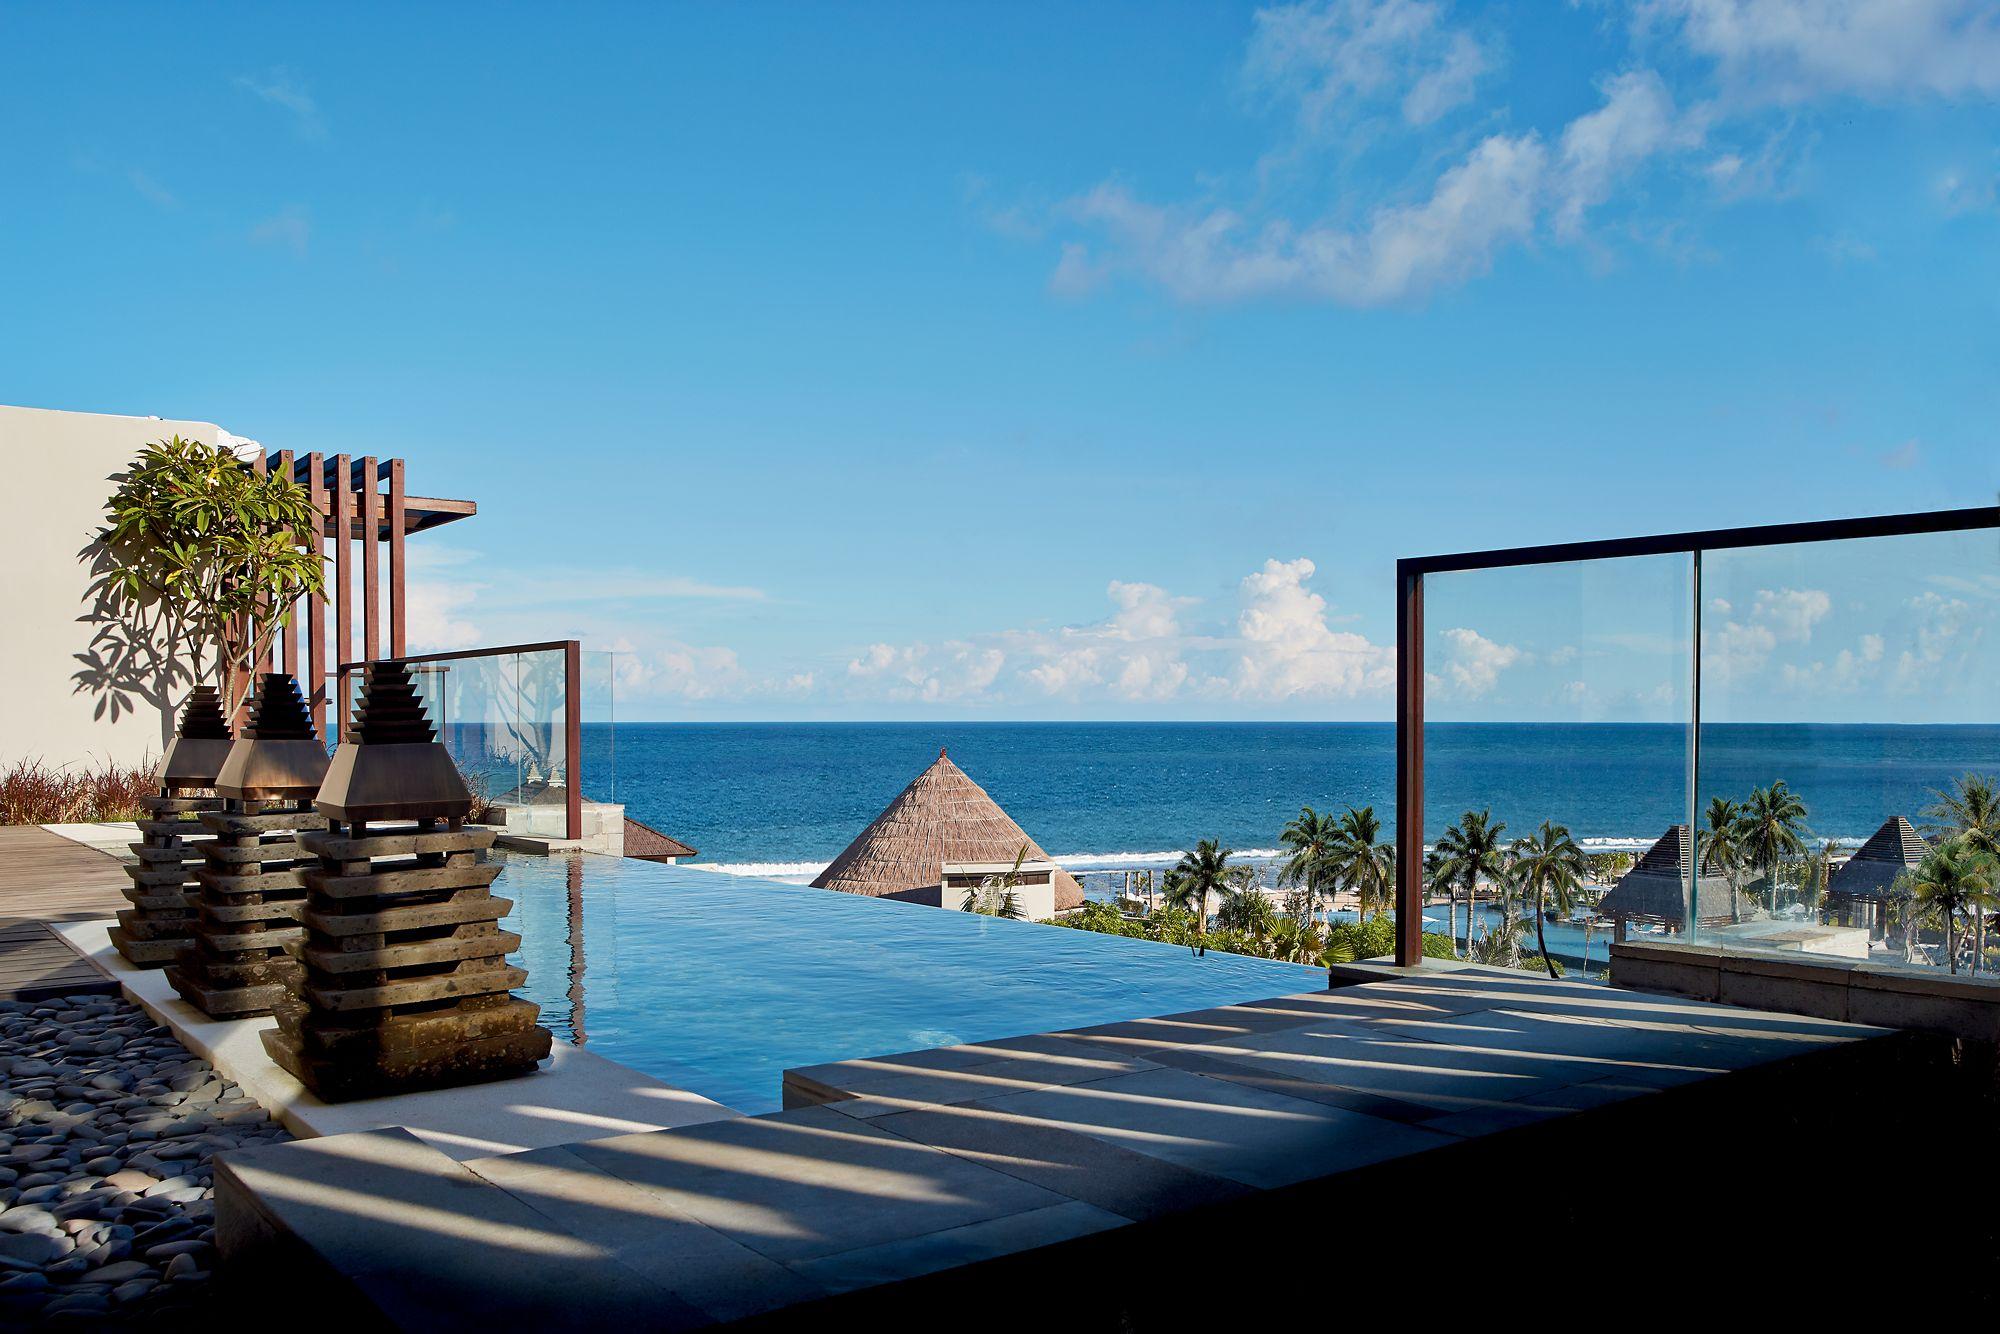 Photo Credit: The Ritz-Carlton, Bali